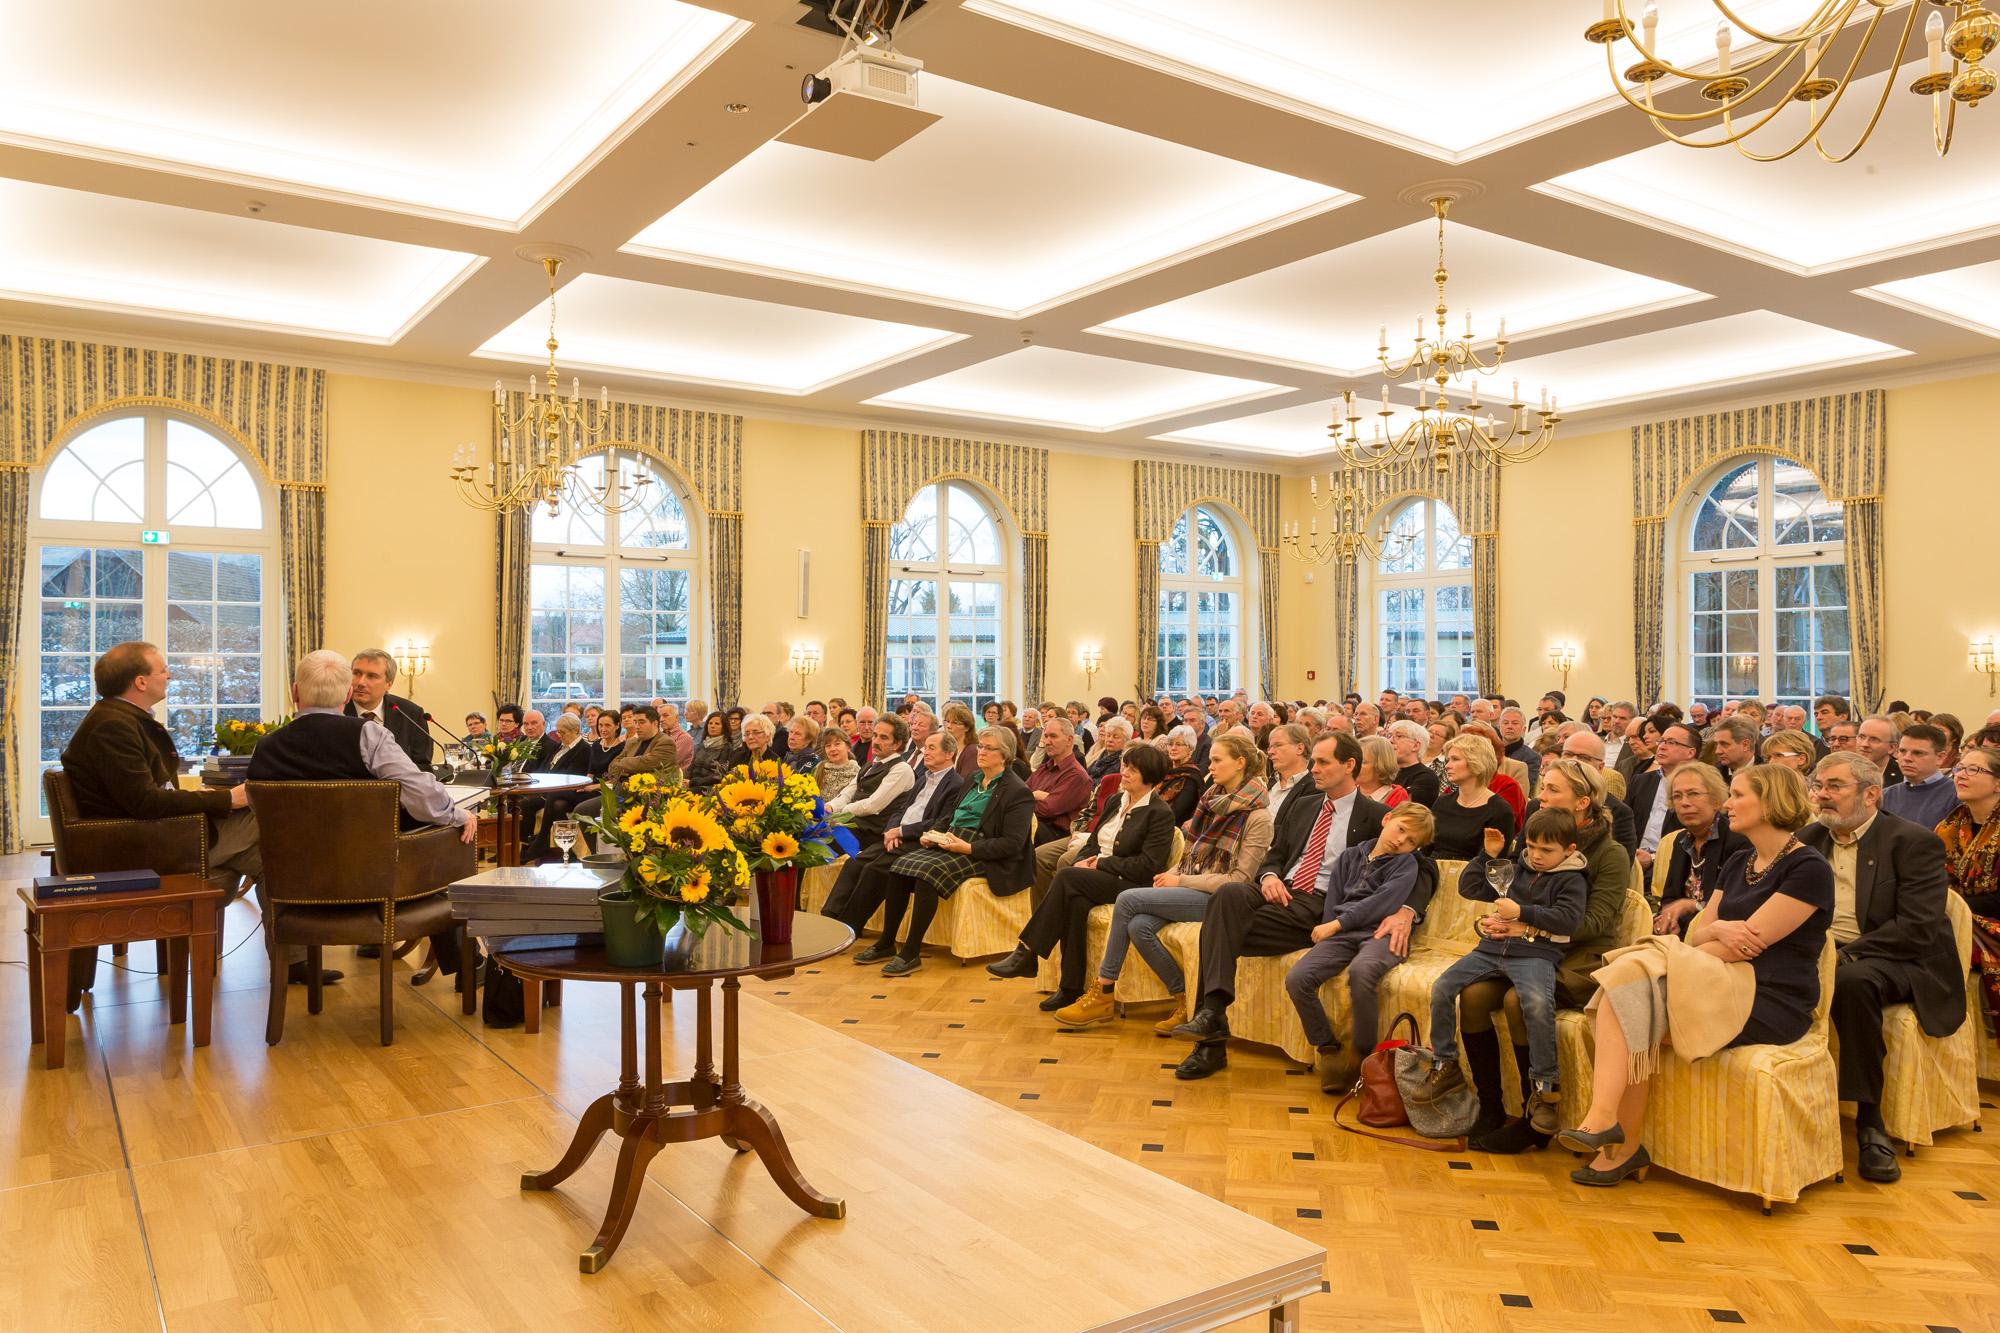 Veranstaltung Spreewald - Schloss Brandenburg - Tagungshotel Spreewald - Heiraten im Spreewald - Schloss Lübbenau im Spreewald